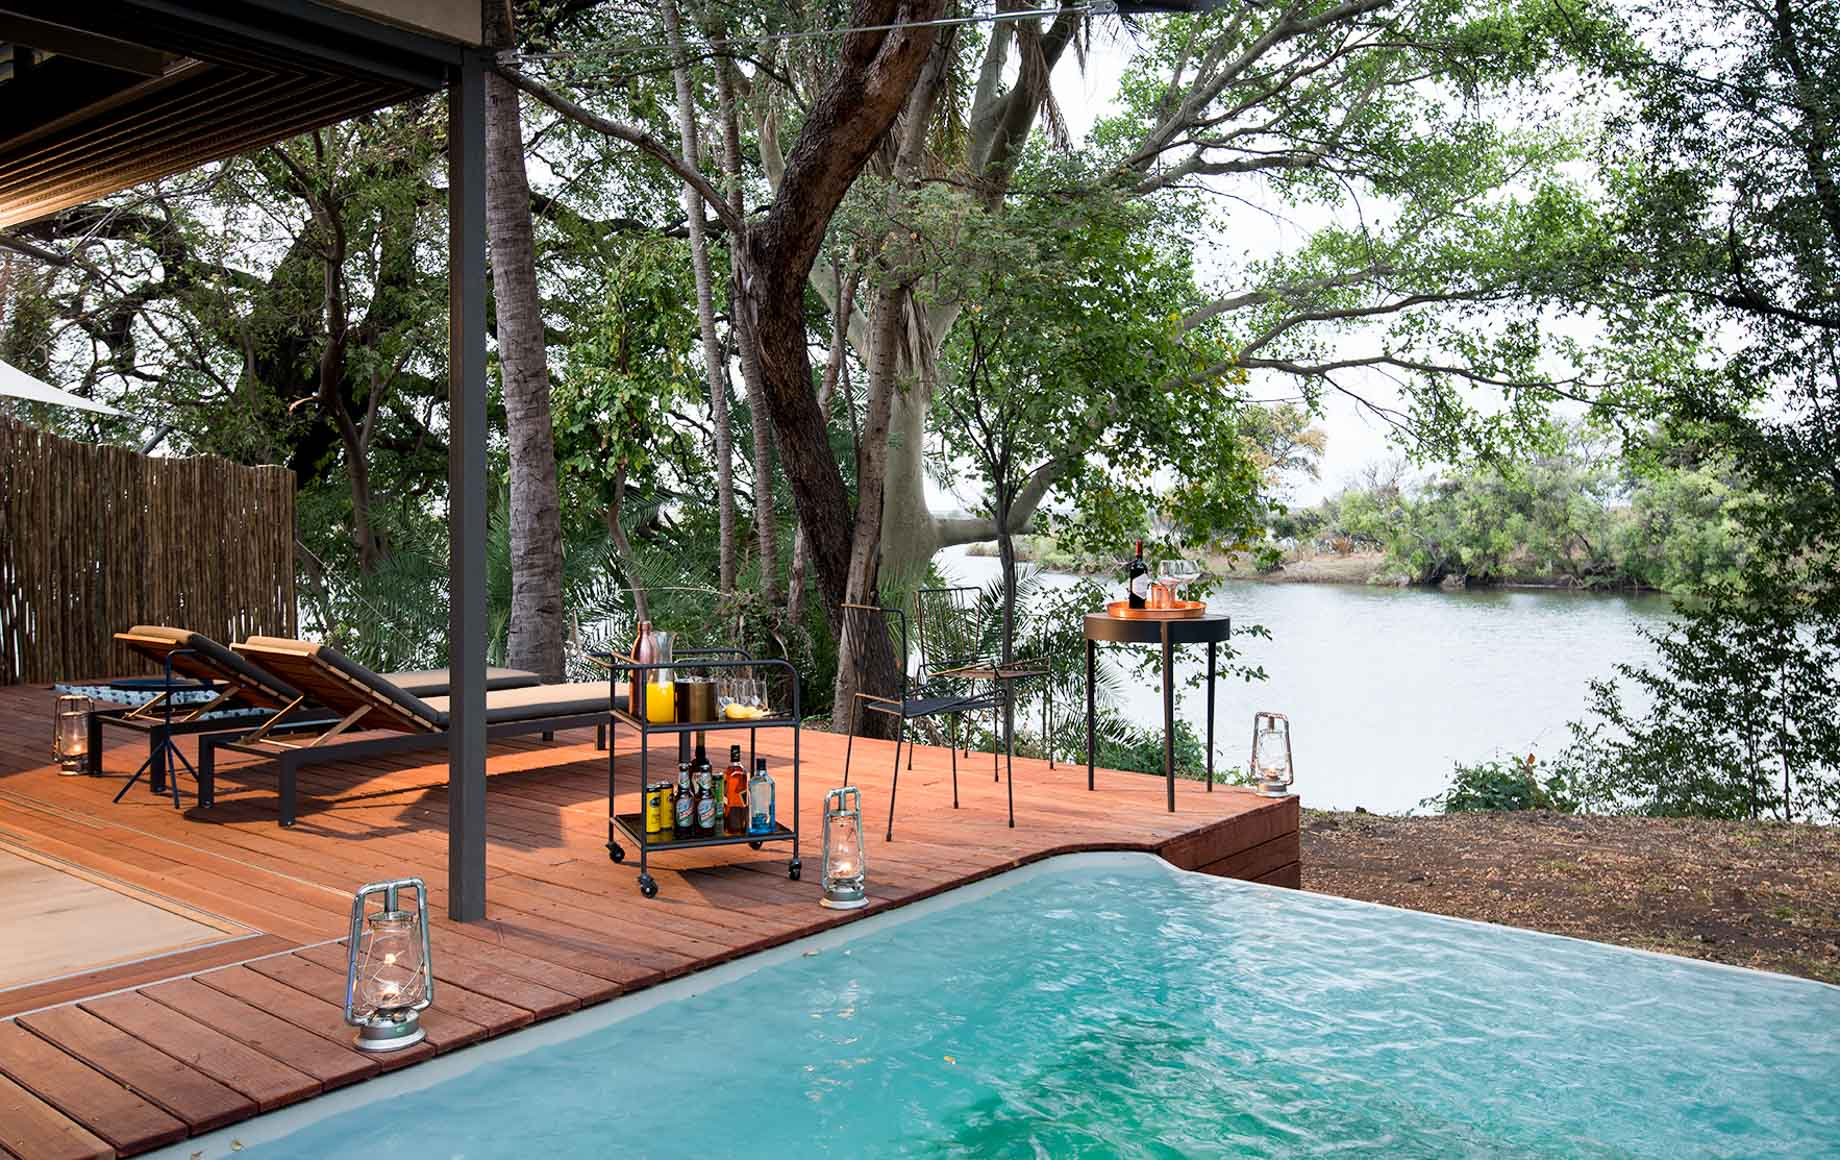 Pool deck of Thorntree River Lodge